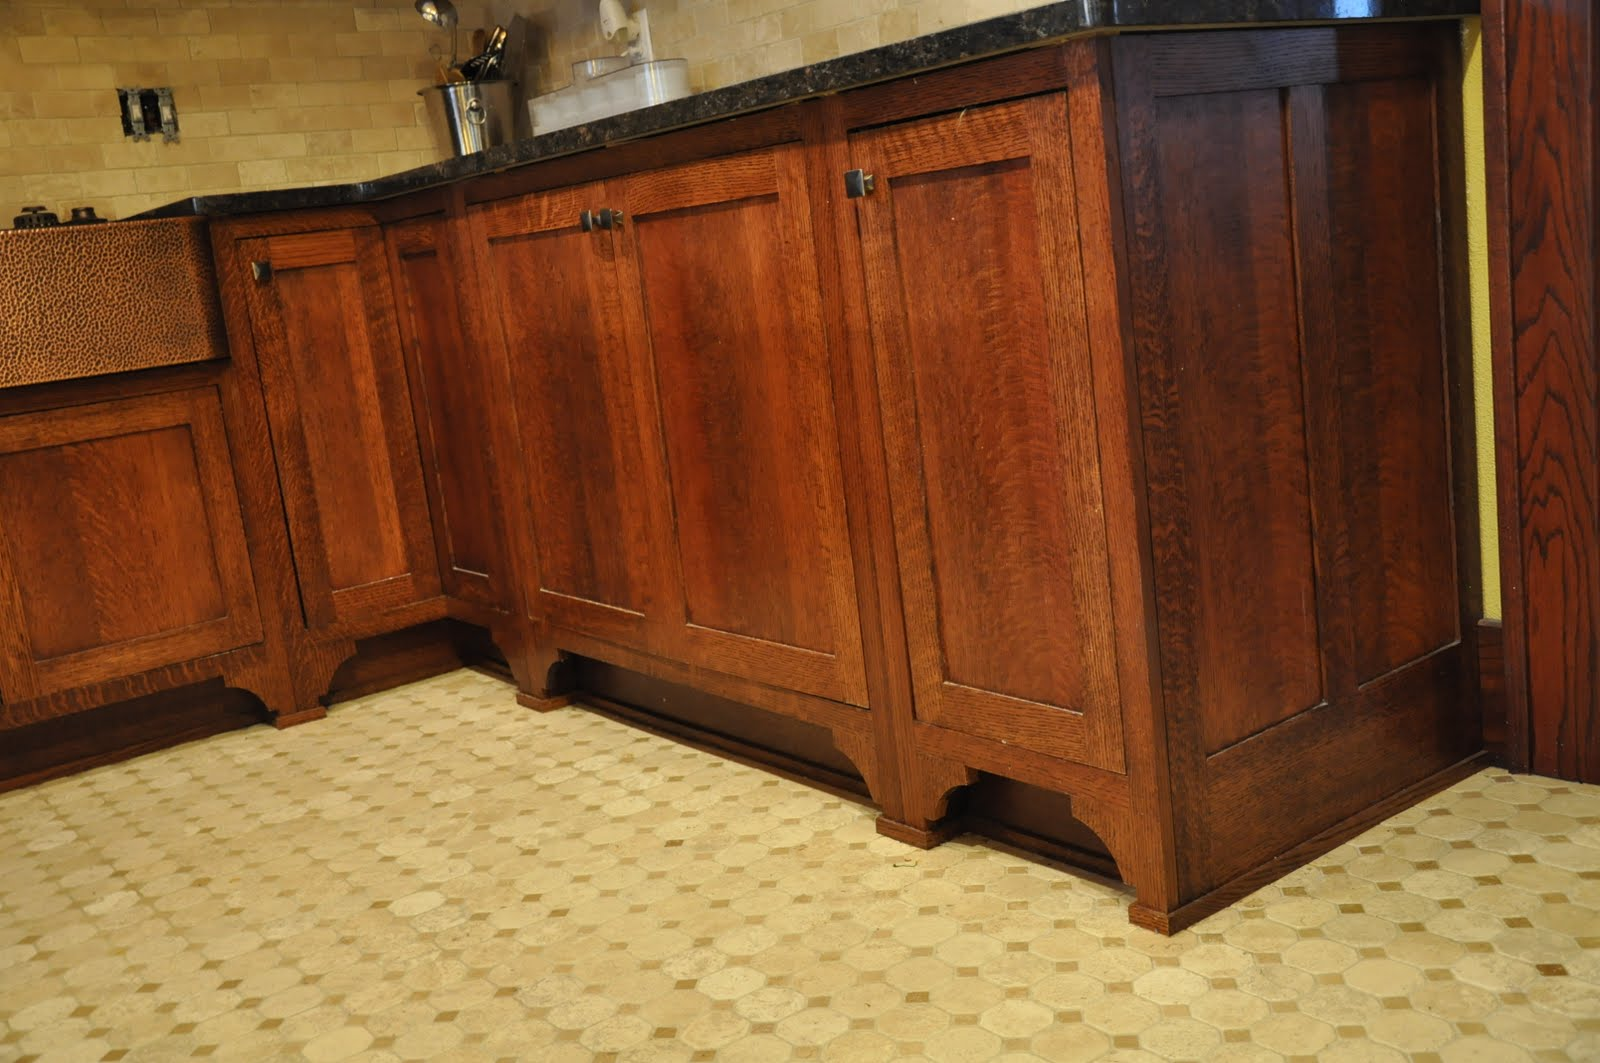 Quarter Sawn Oak Cabinets